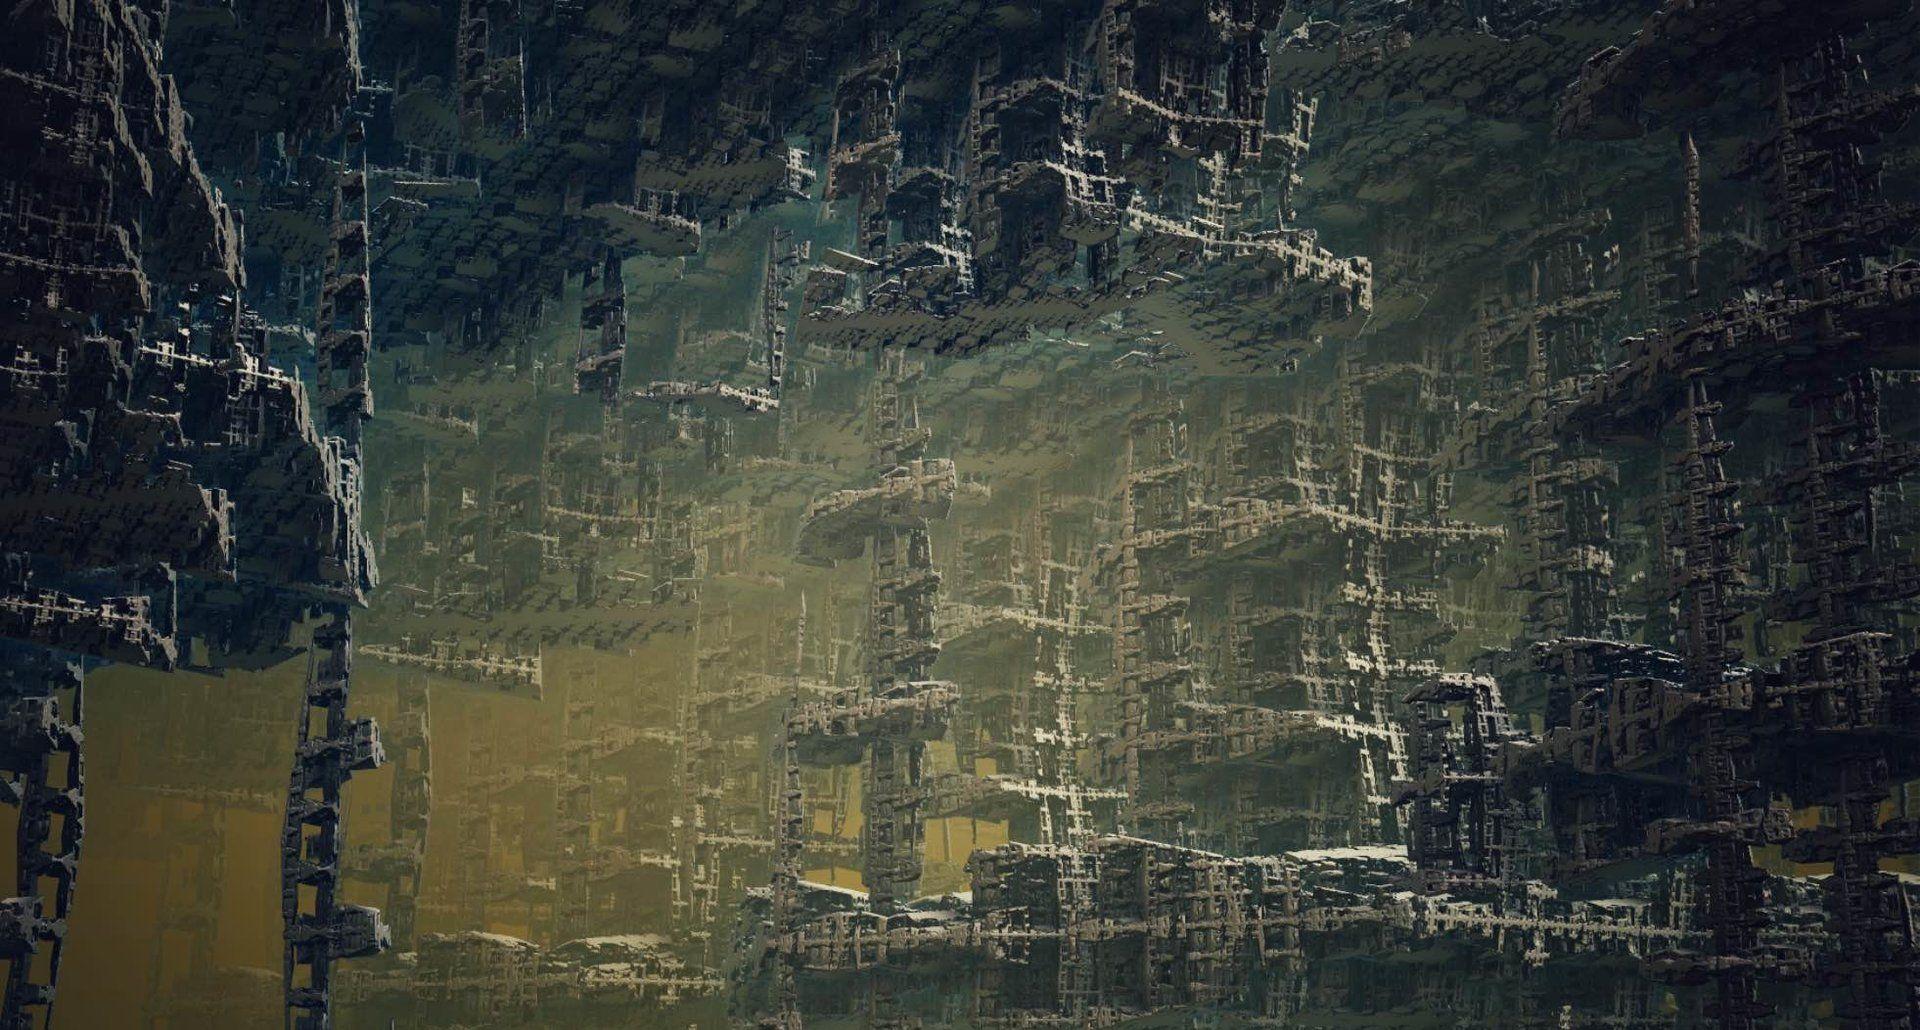 ArtStation - Fractals #3 - The Fallen City, Tomasz Artur Bolek